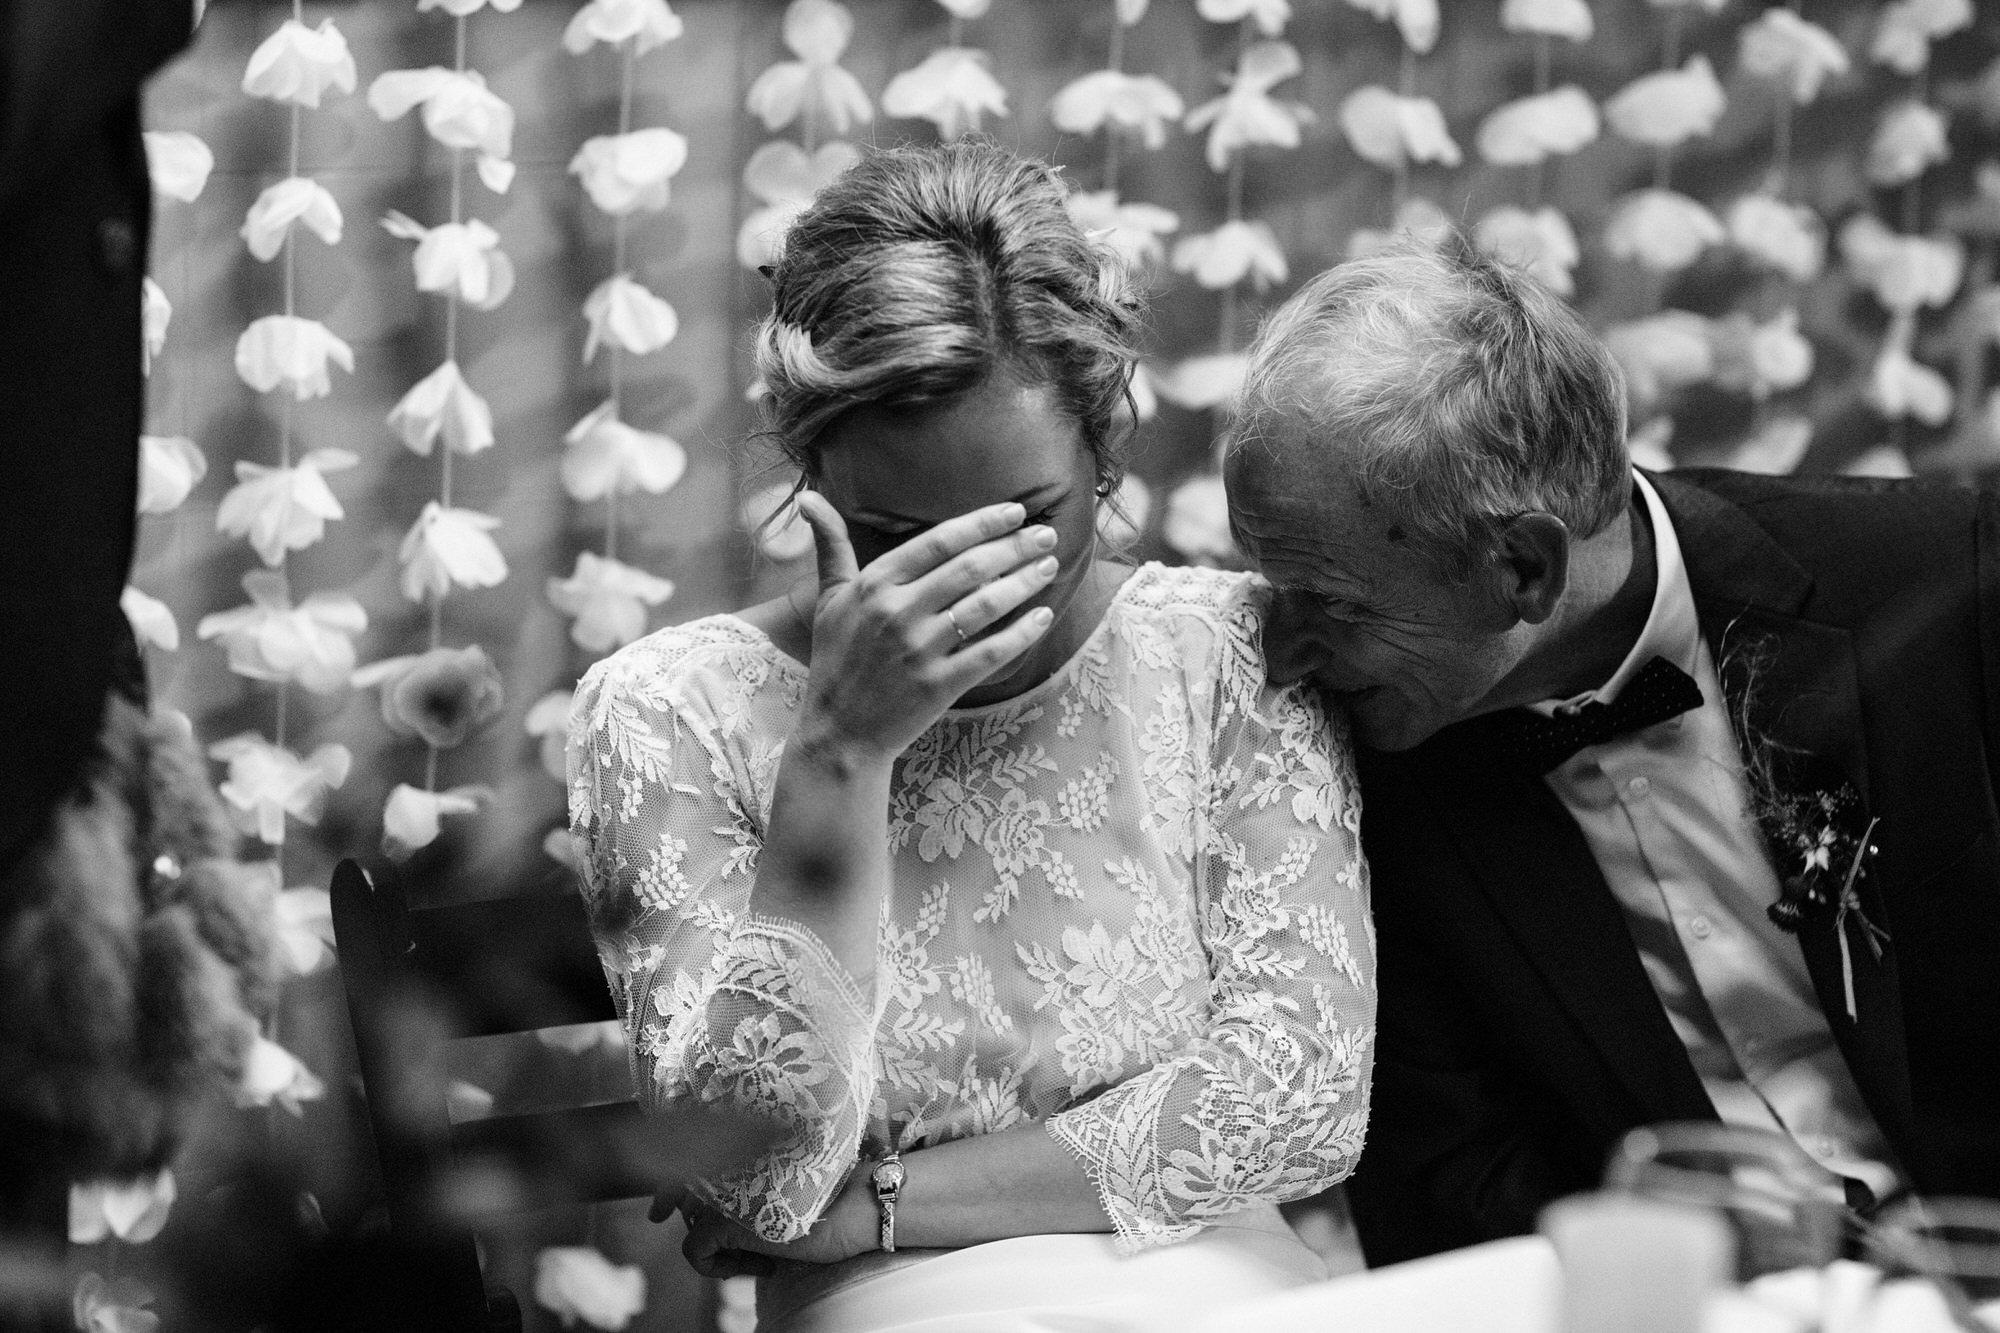 057 TIN SHED KNOCKRAICH WEDDING AUTUMN ZOE ALEXANDRA PHOTOGRAPHY